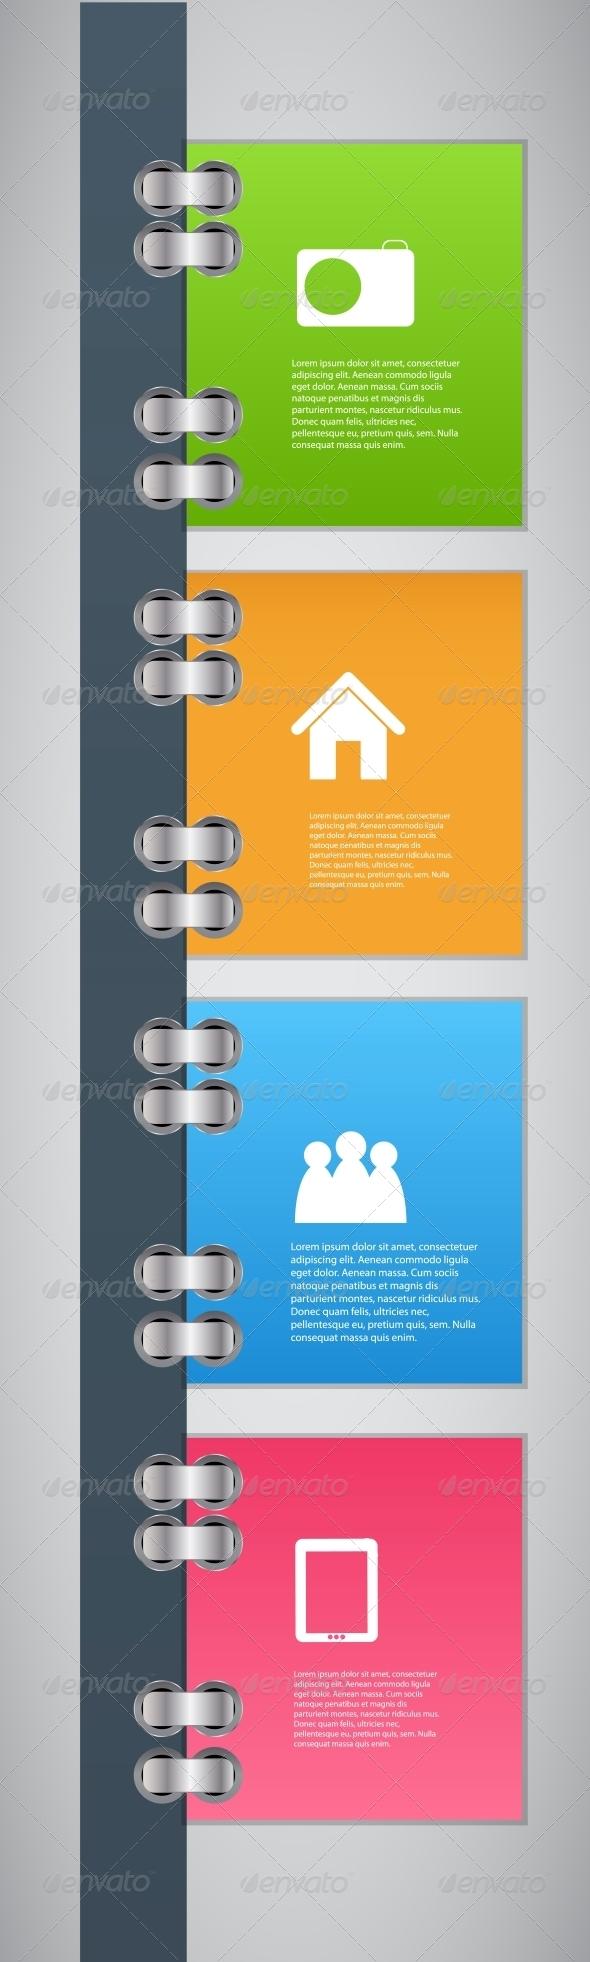 GraphicRiver Infographic Template Design Vector Illustration 4797597